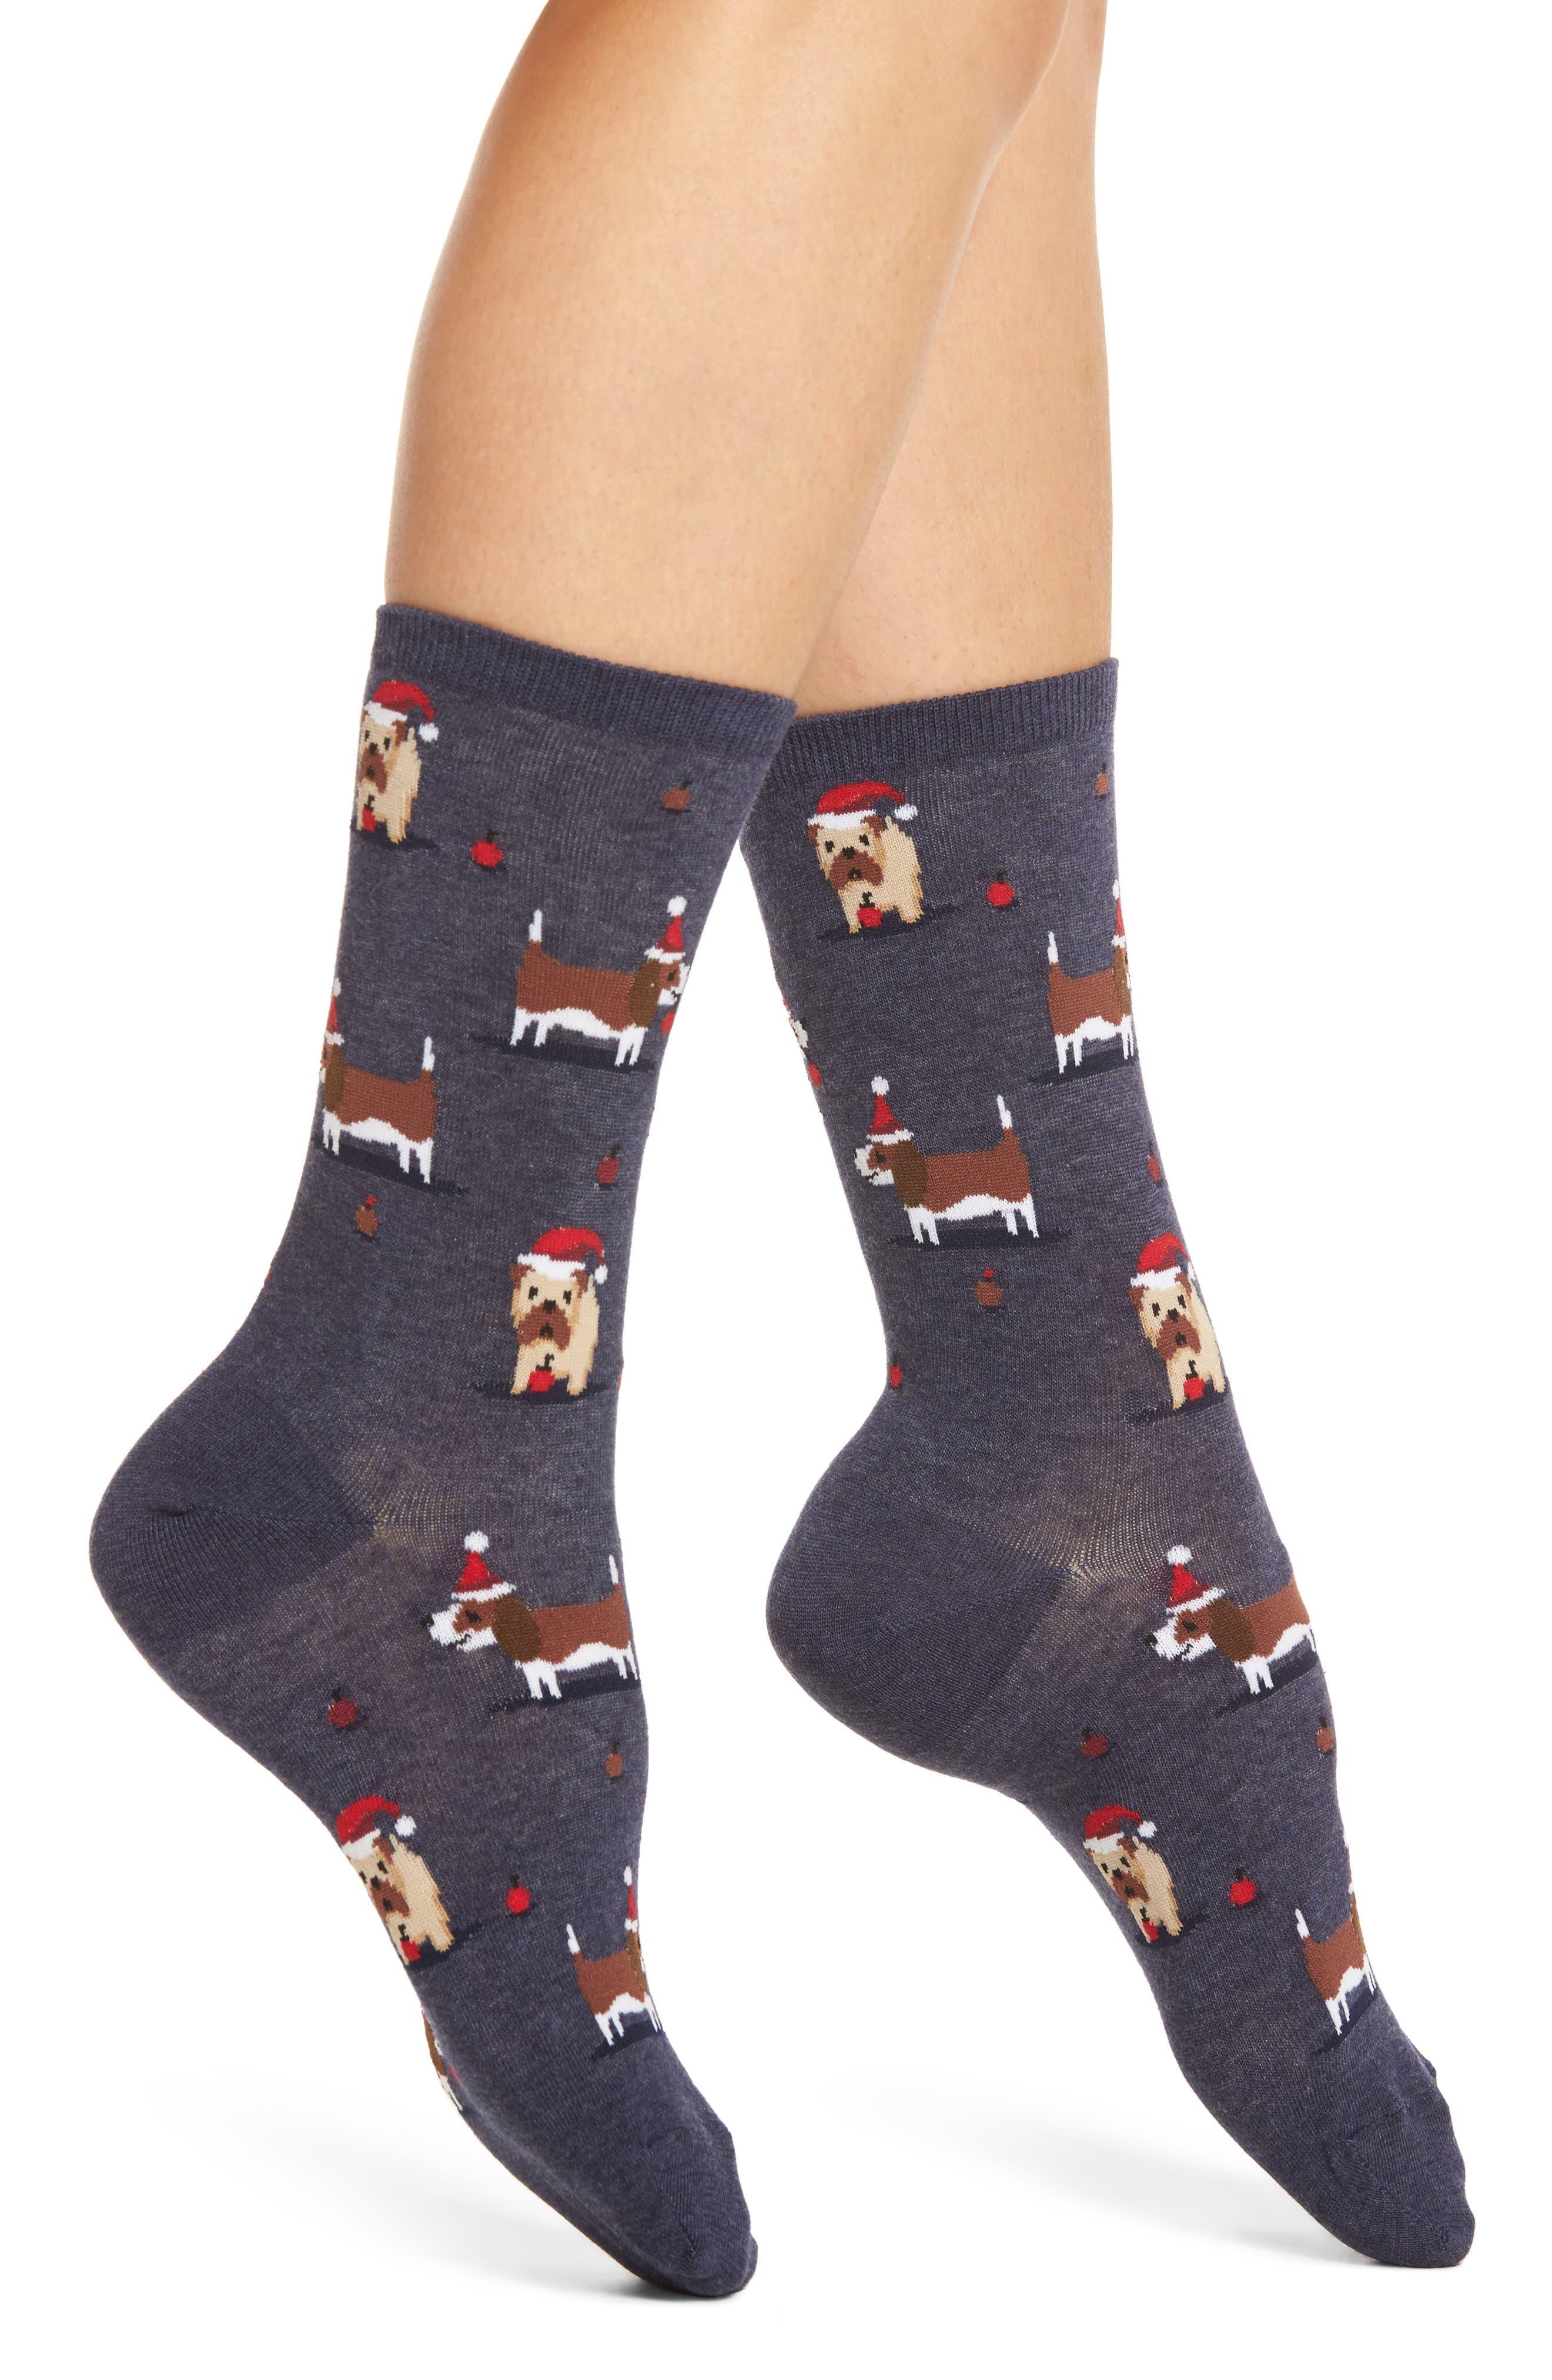 Hot Sox Christmas Doggies Crew Socks